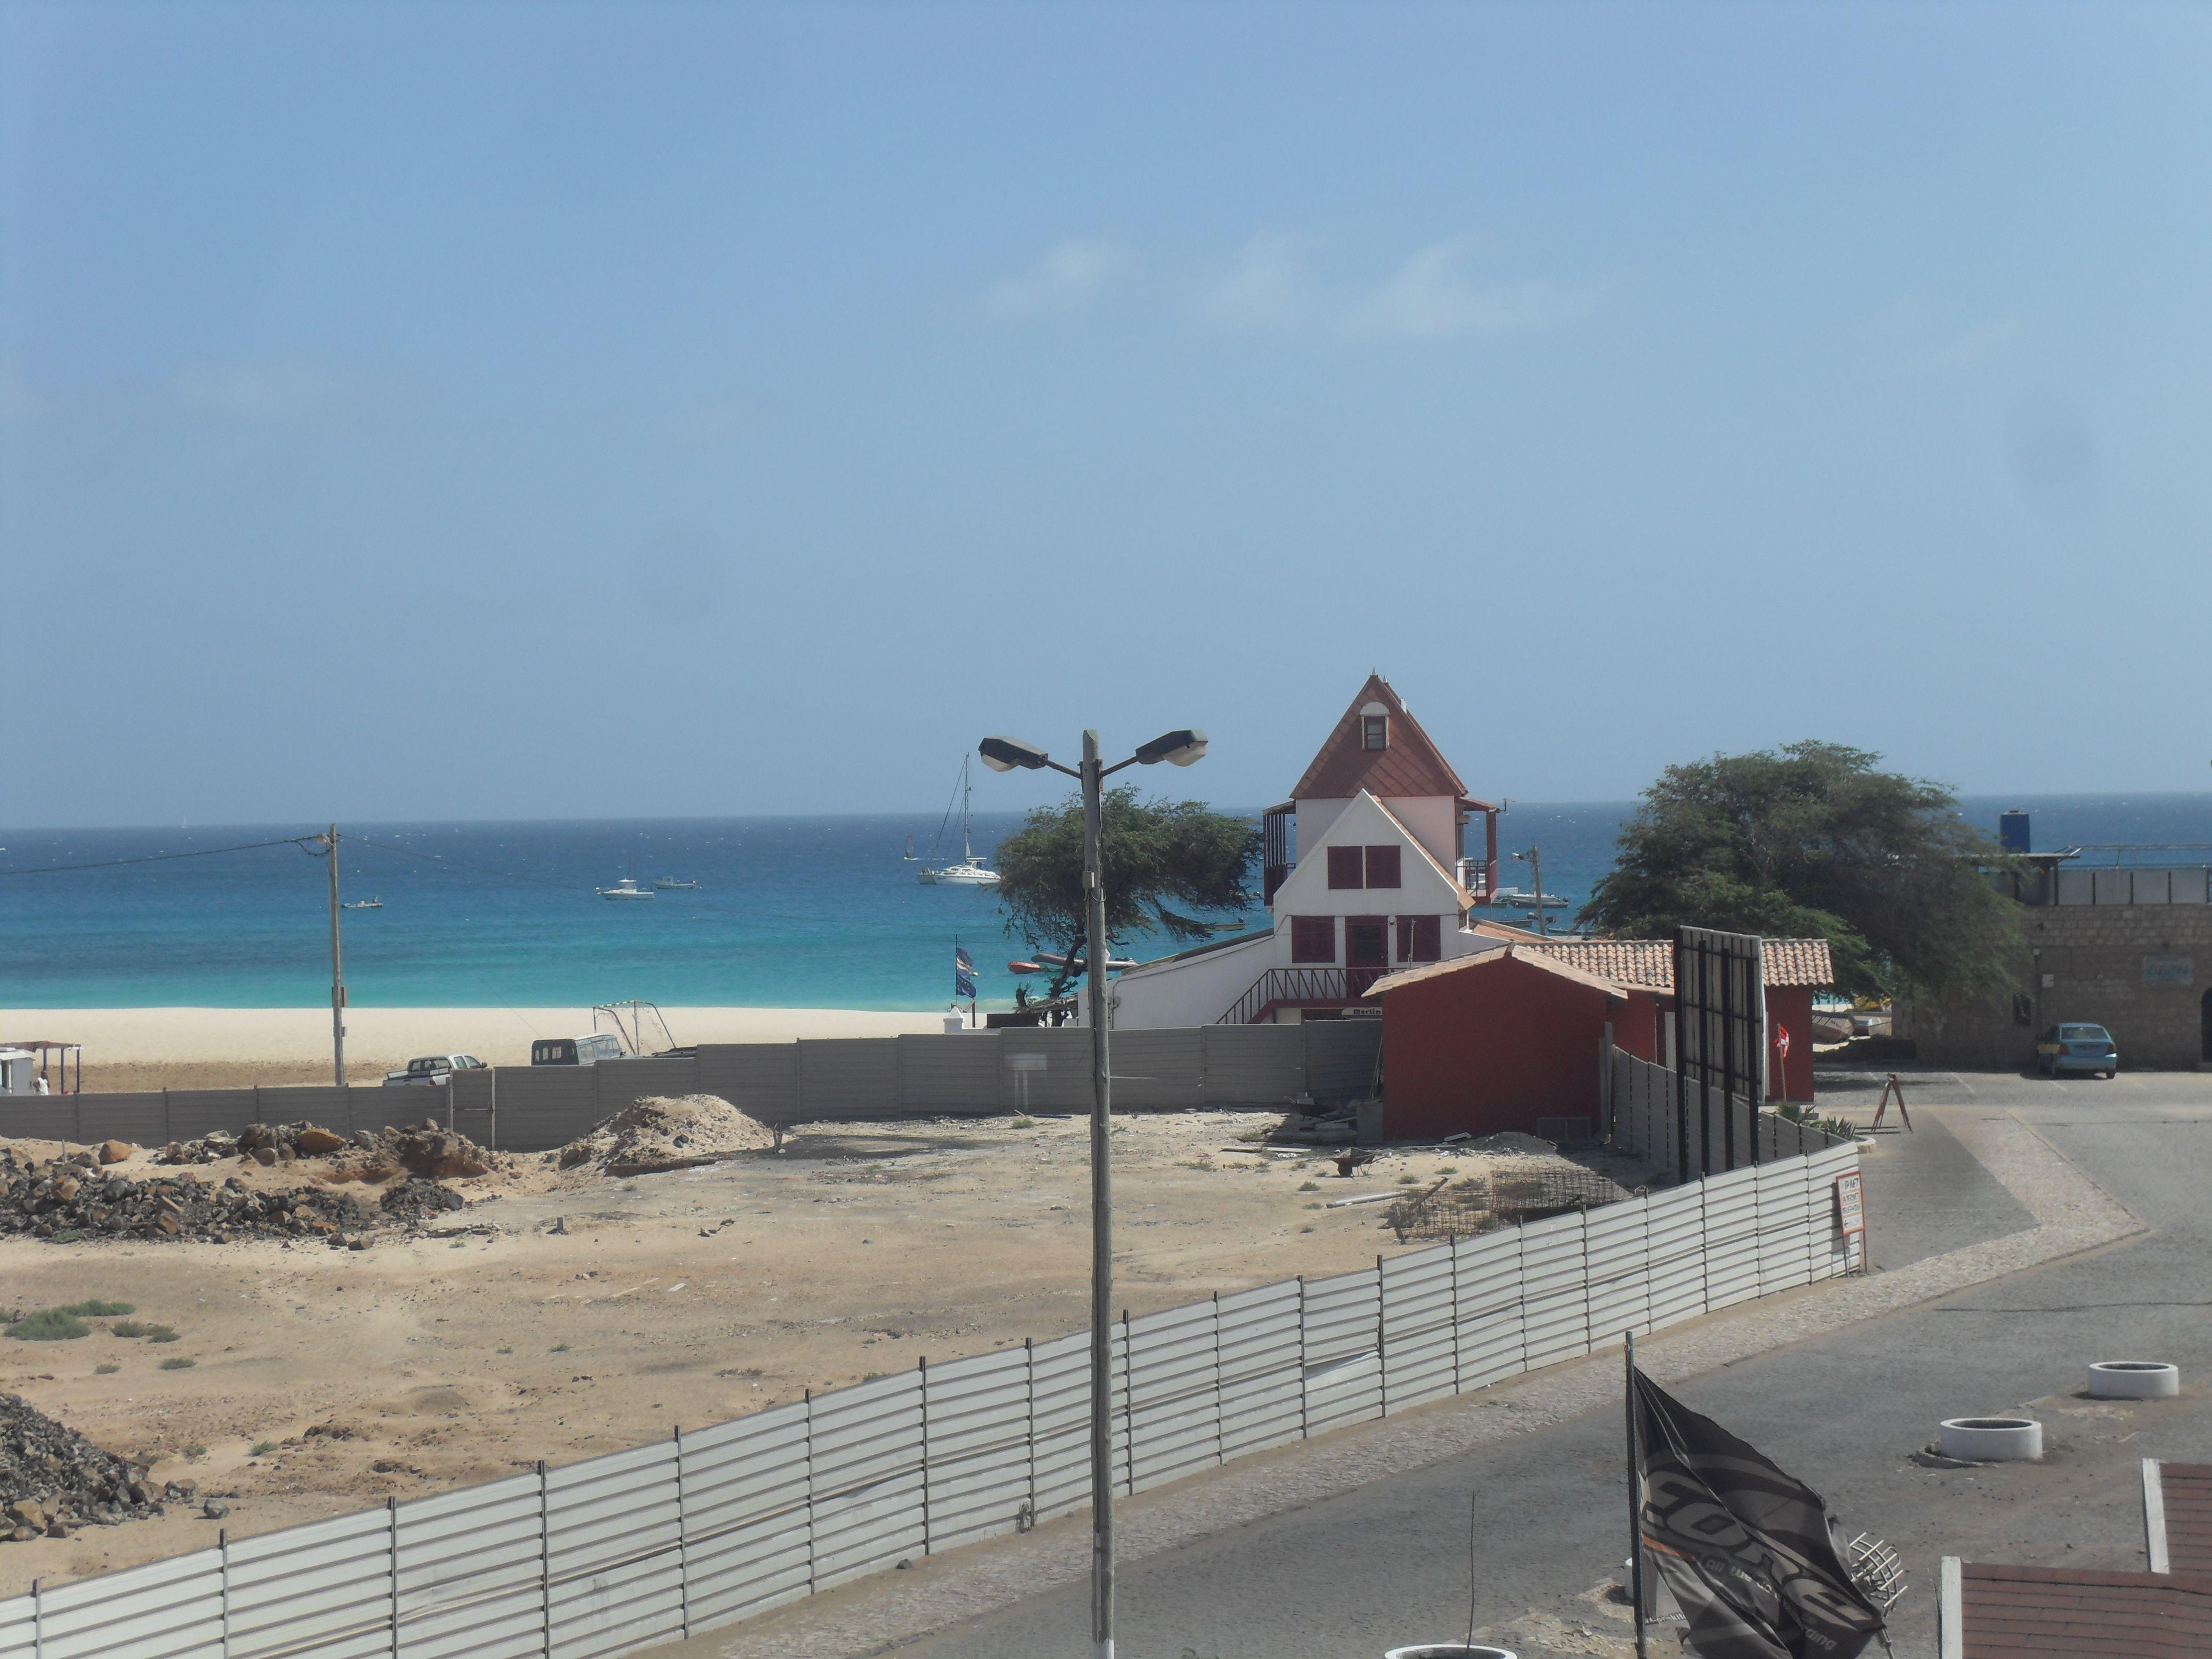 Pier View, Santa Maria, Sal, Cape Verde